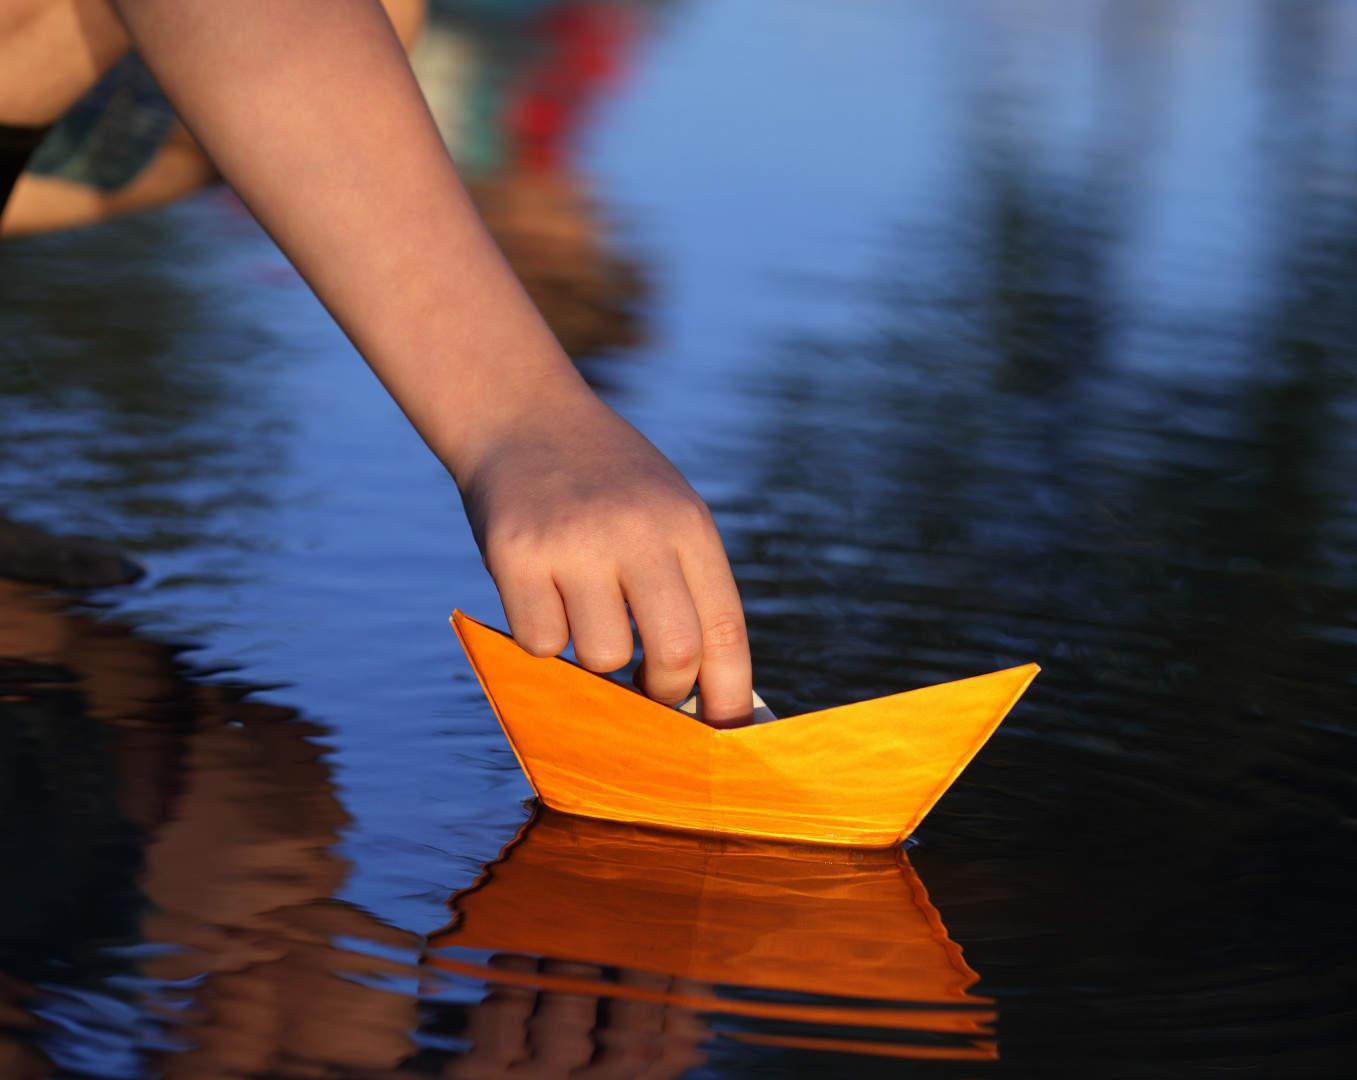 Paper boat launch